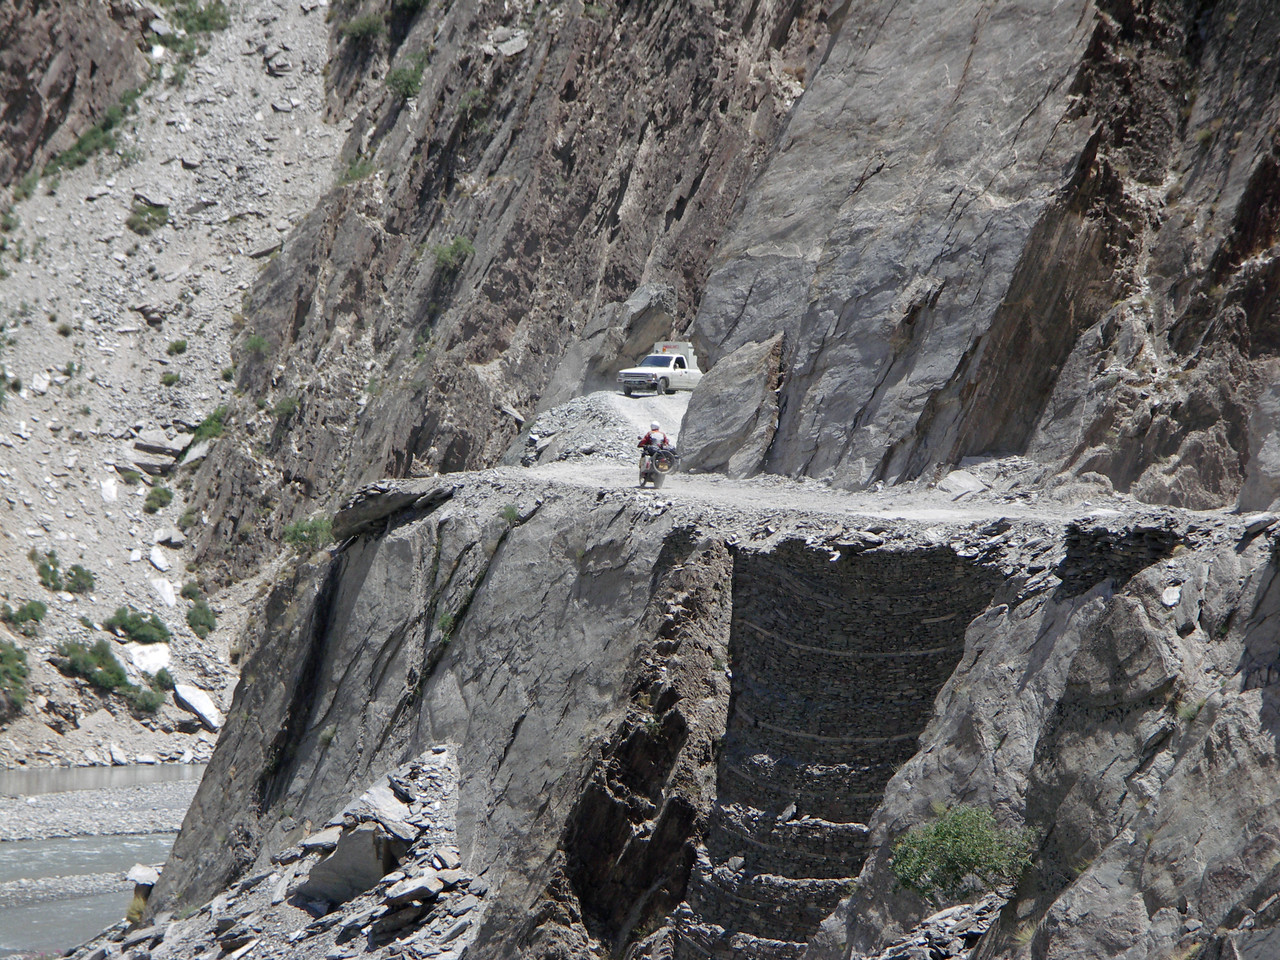 Chitral - Garam Chashma road